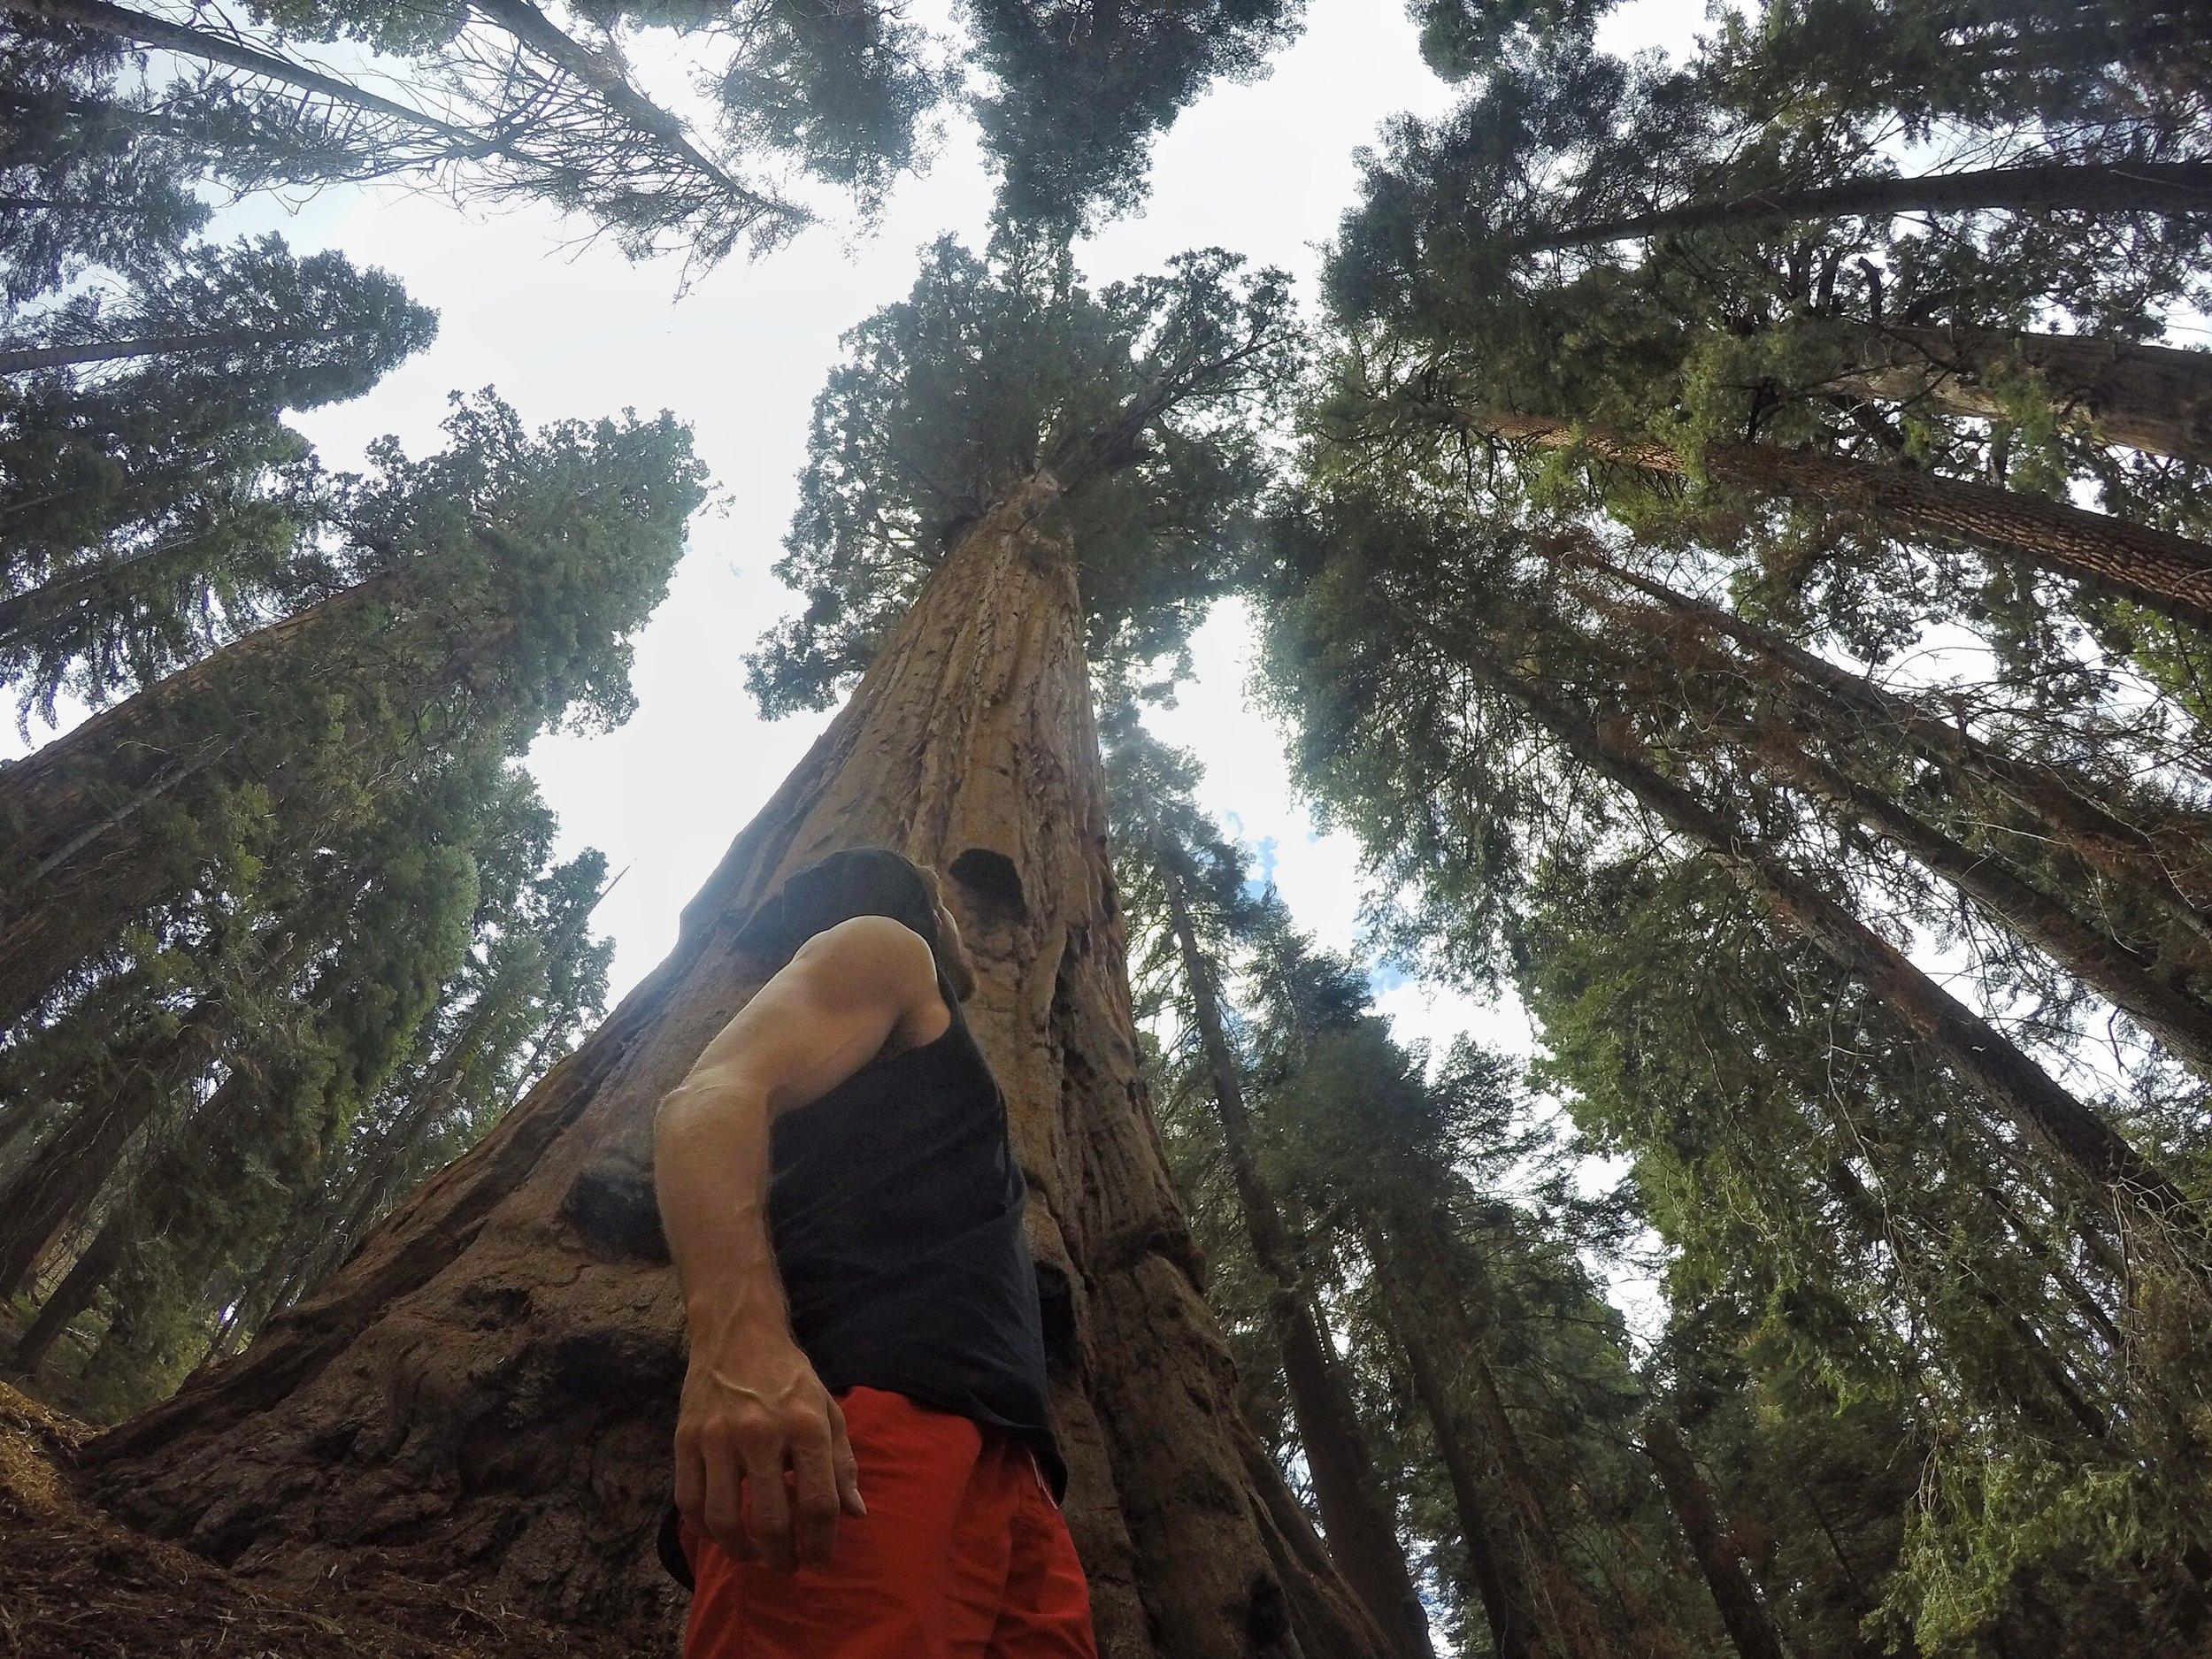 Aaron Medeiros amongst Sequoia trees, CA, US - 3 Days*